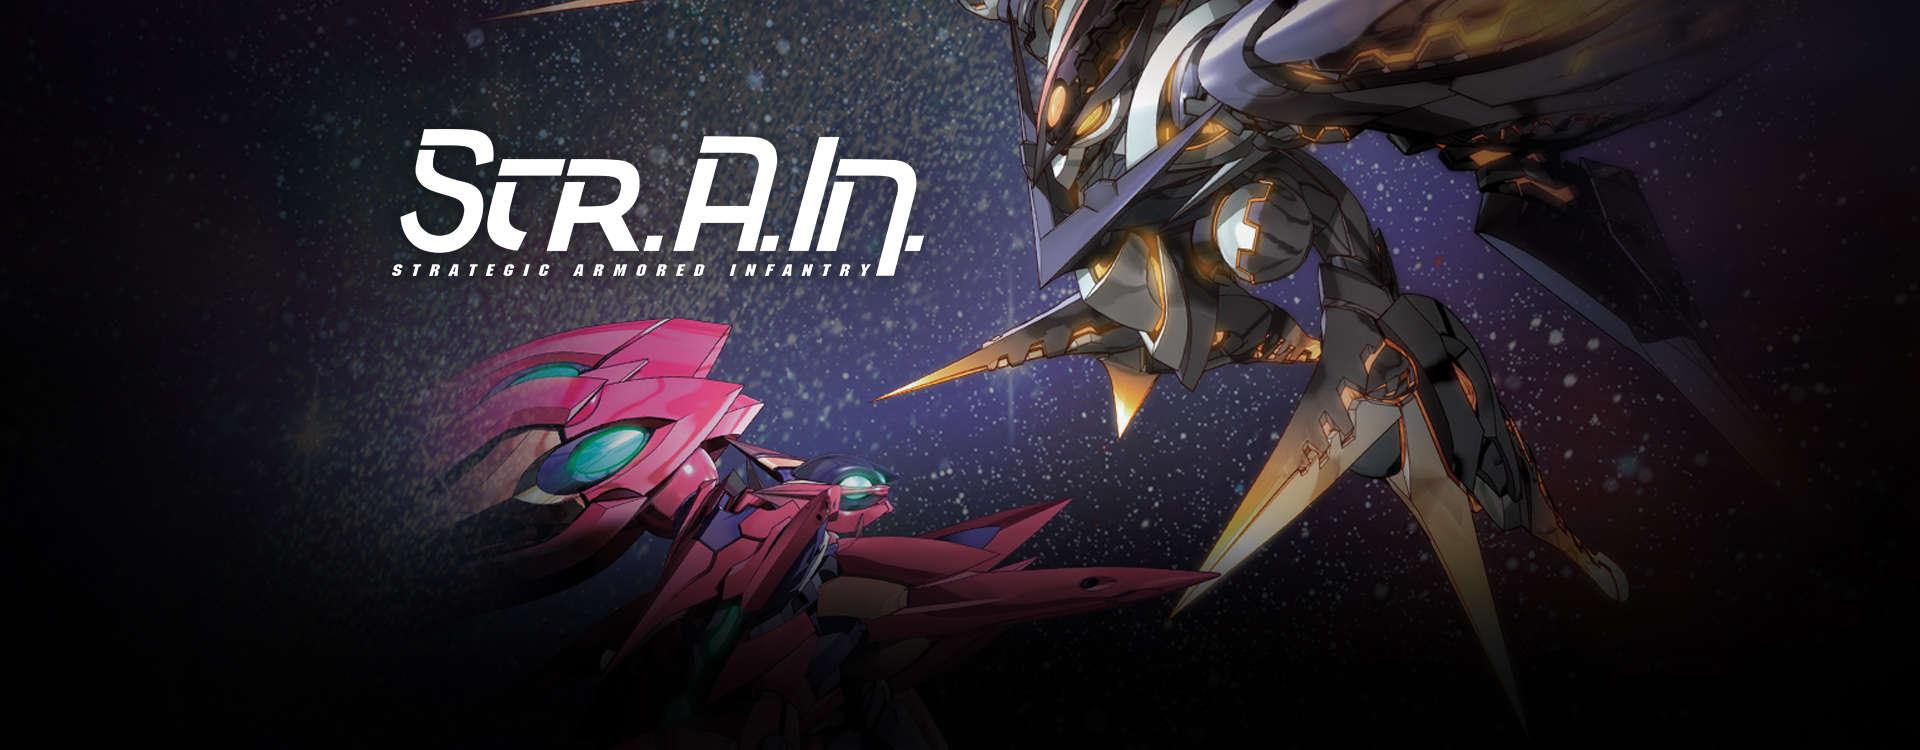 STRAIN: Strategic Armored Infantry